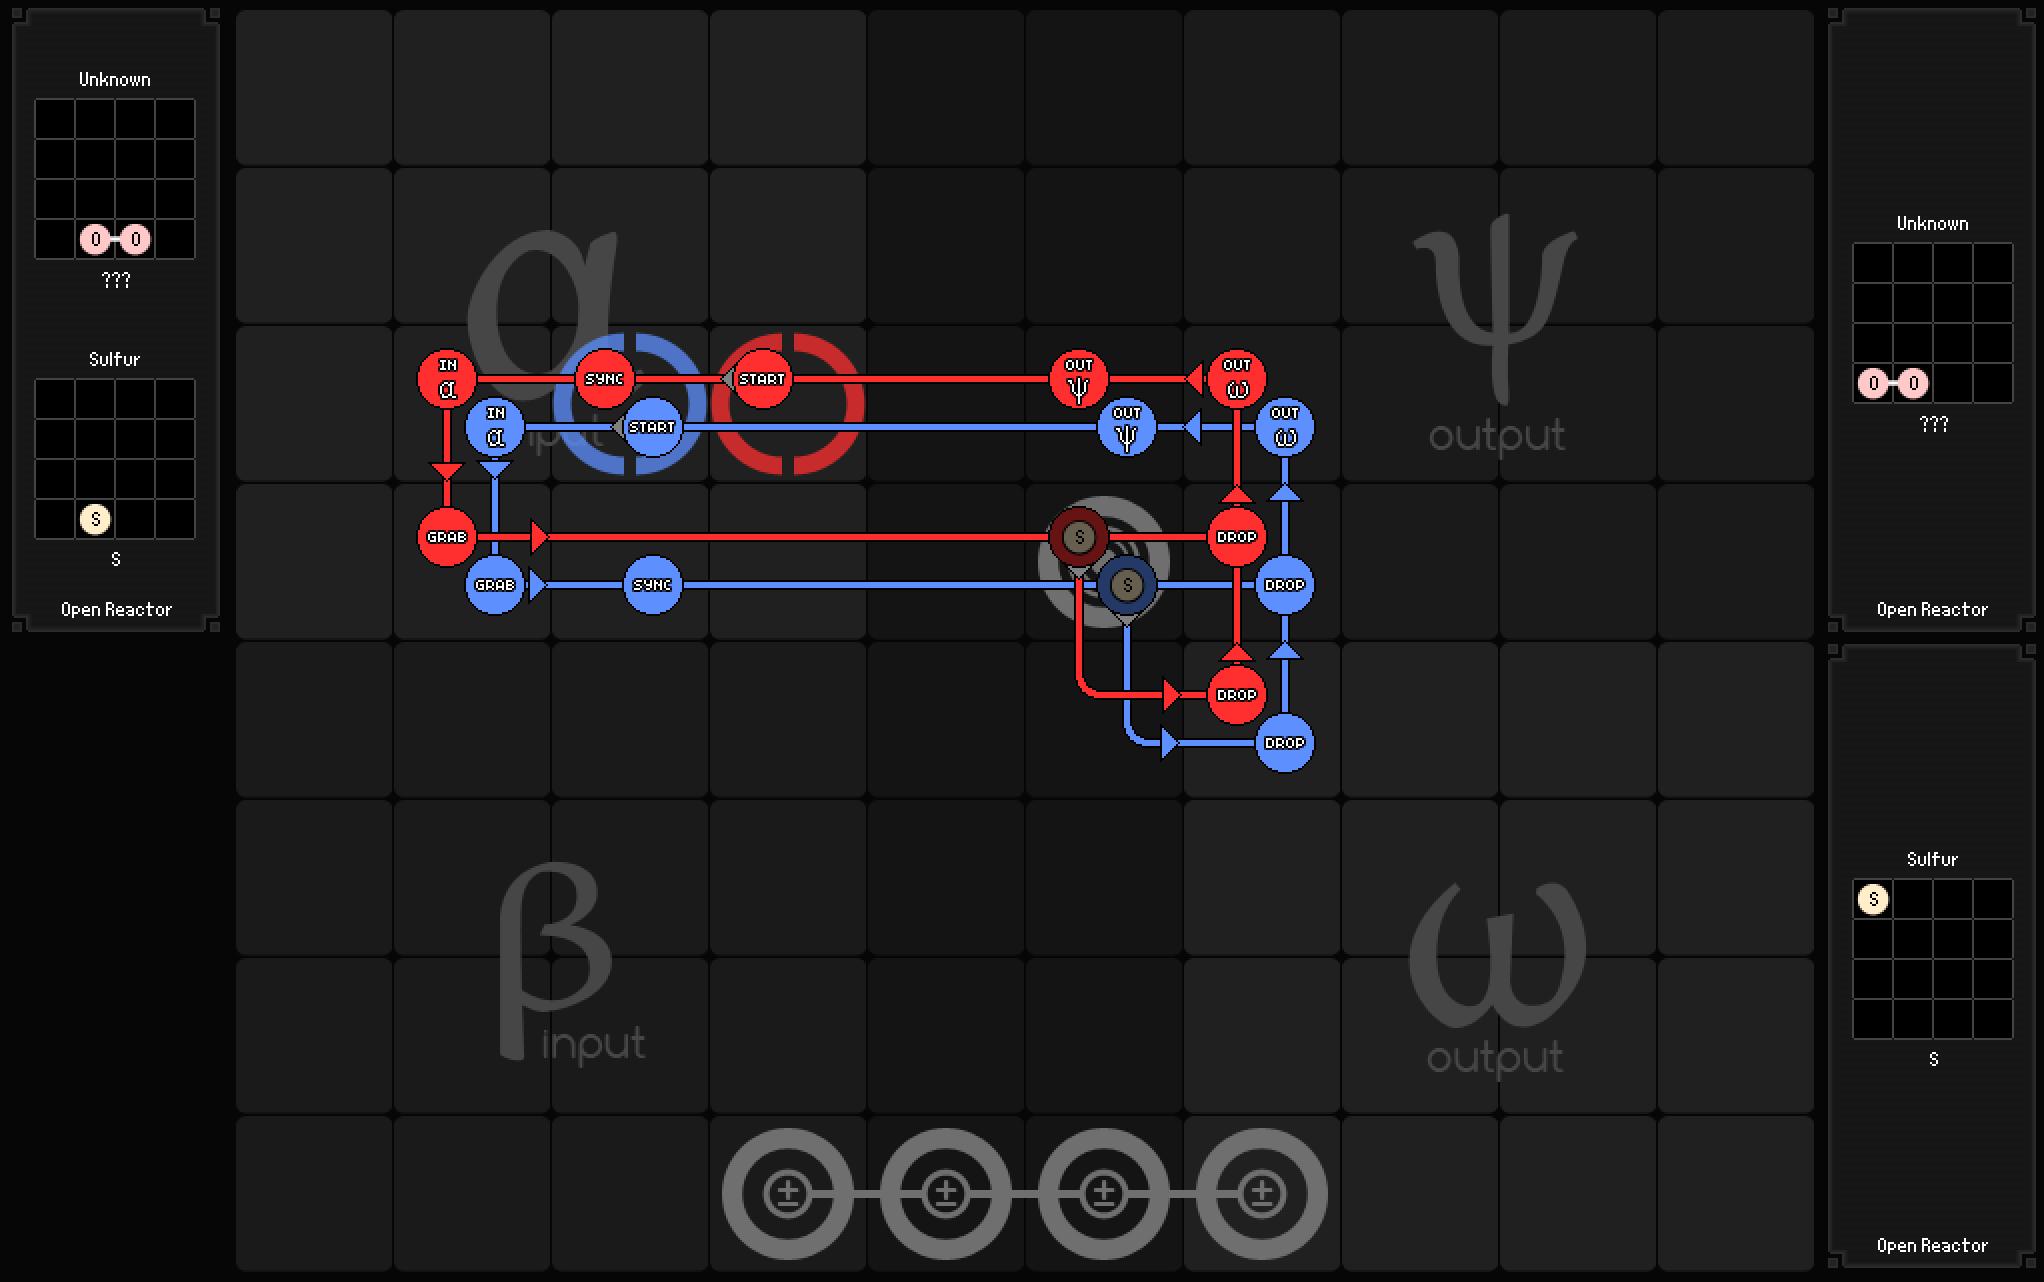 1_Story_Mode/4_Alkonost/SpaceChem-4.6.a/Reactor_2.png